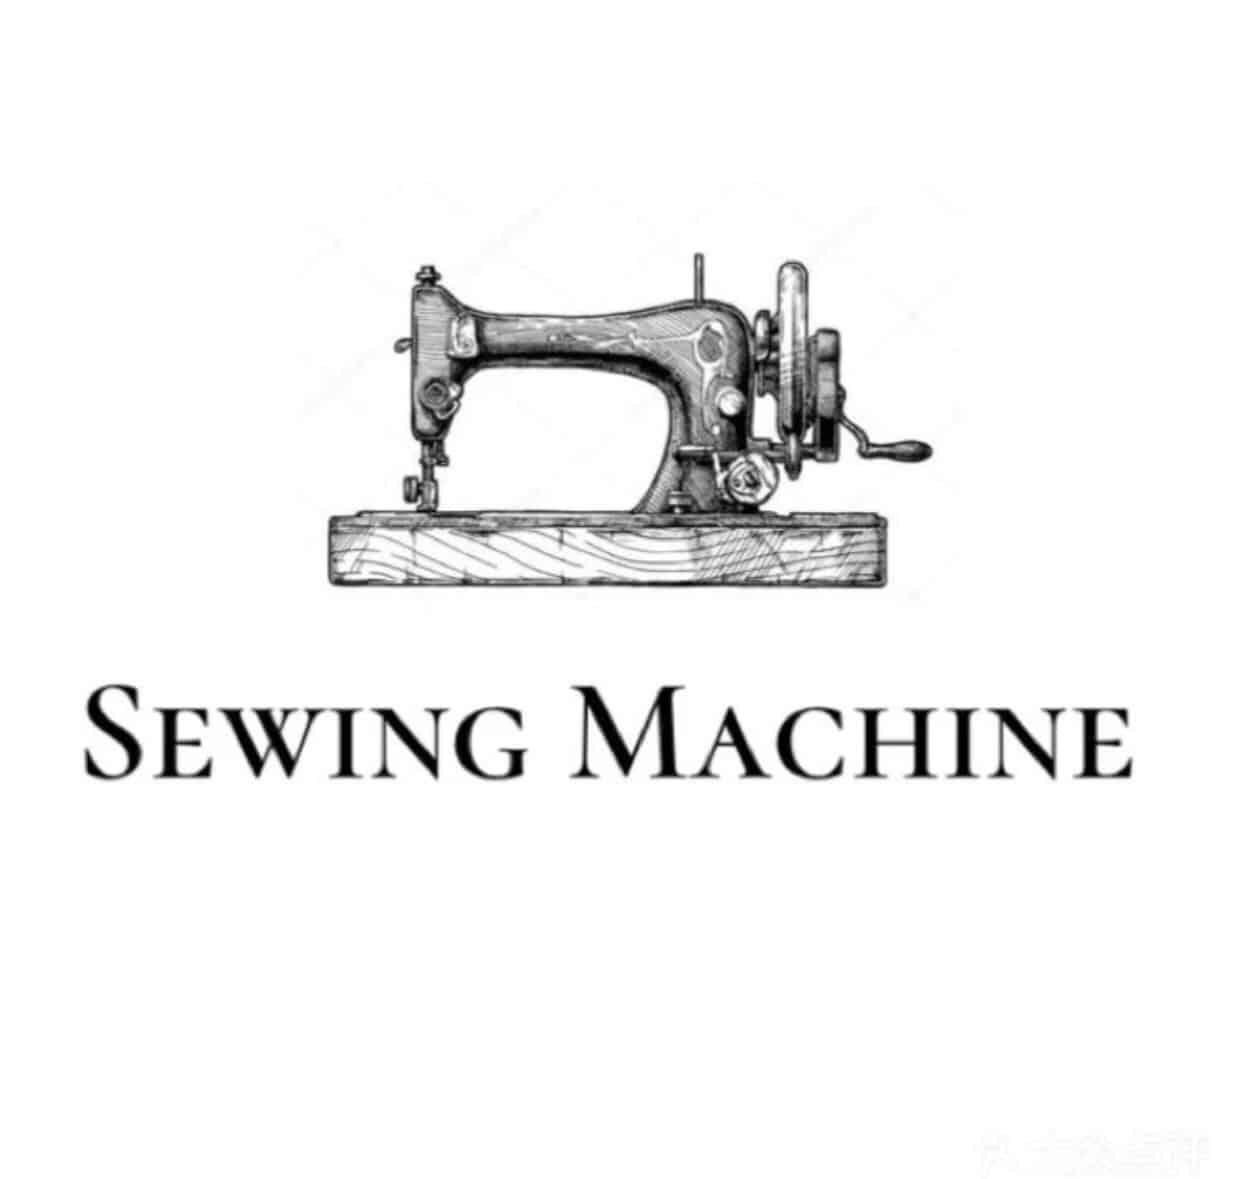 sewing machine logo chengdu expat